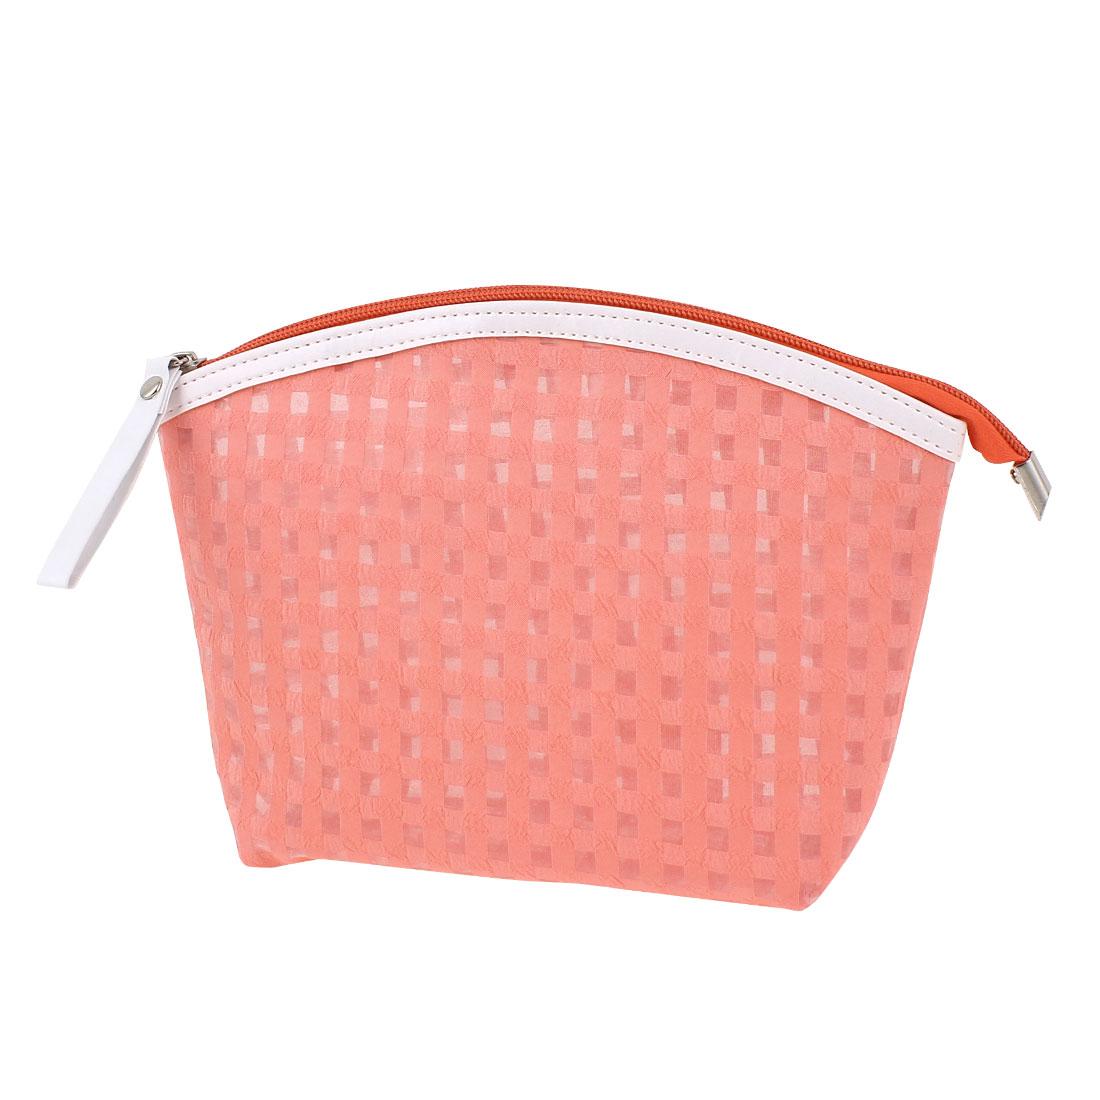 Travel Portable Zip Up Checks Pattern PVC Cosmetic Makeup Bag Toiletries Sundries Holder Handbag Salmon Pink for Lady